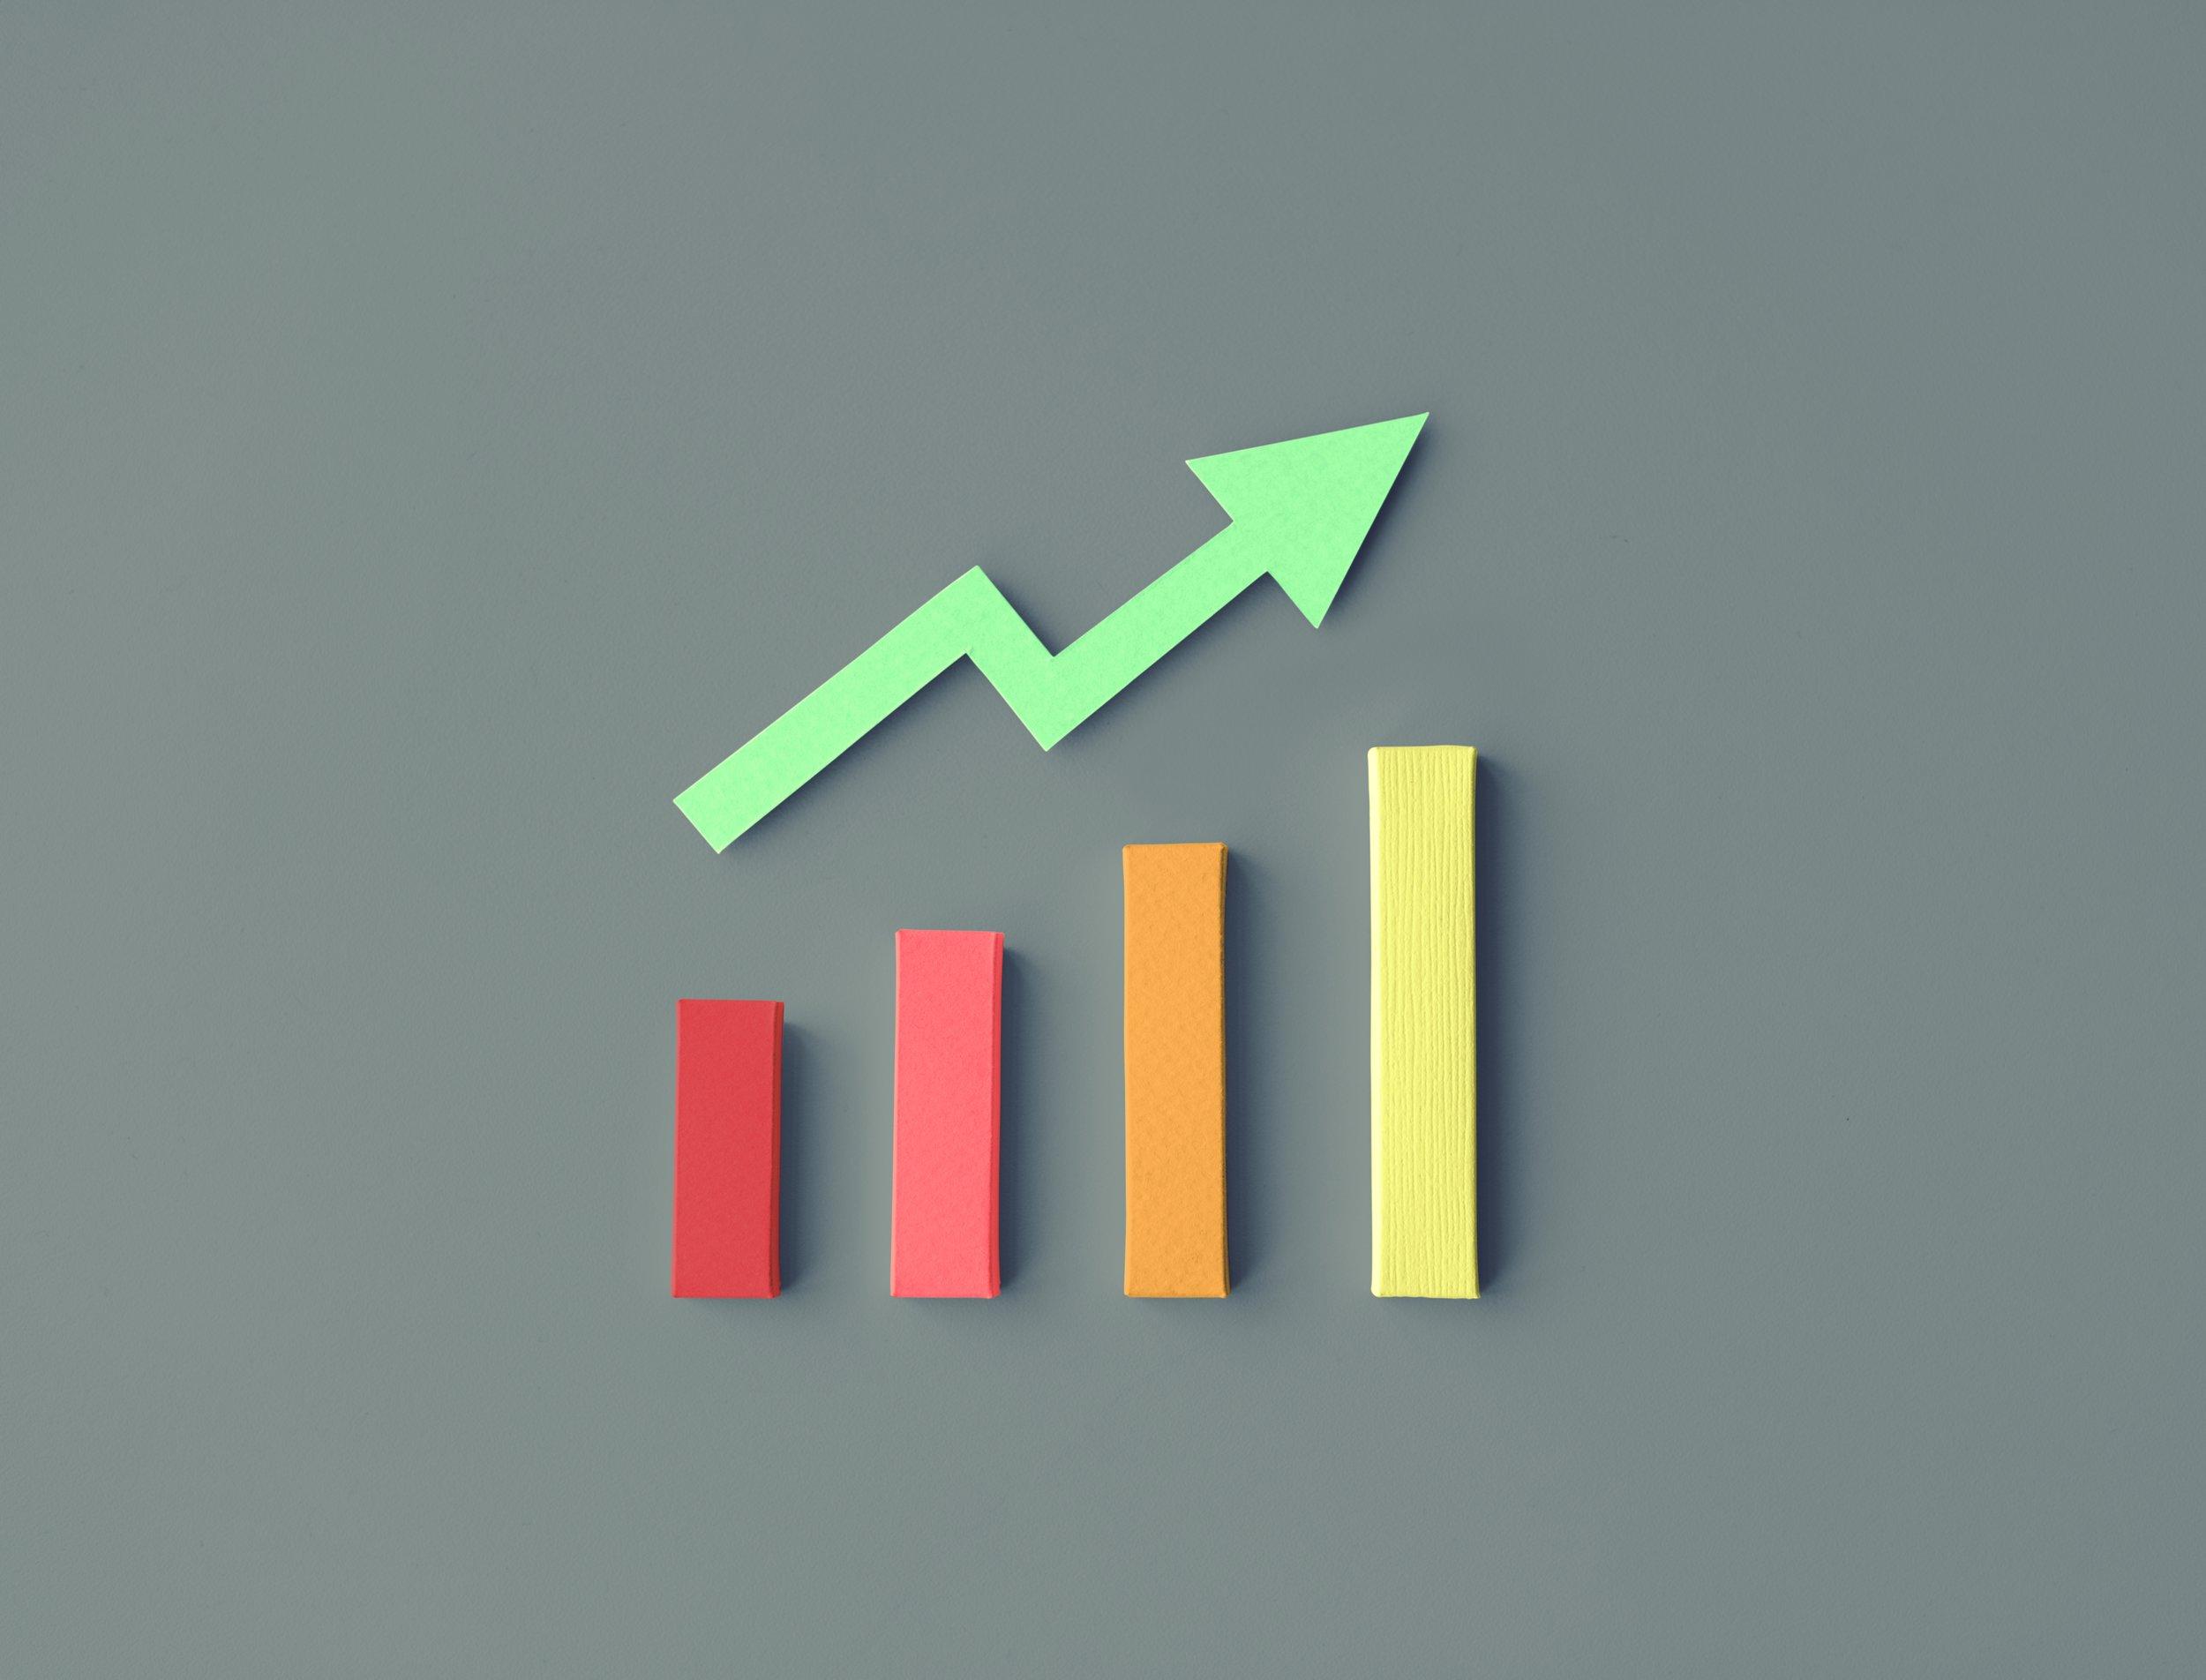 statistics-strategy-analysis-diagram-information.jpg